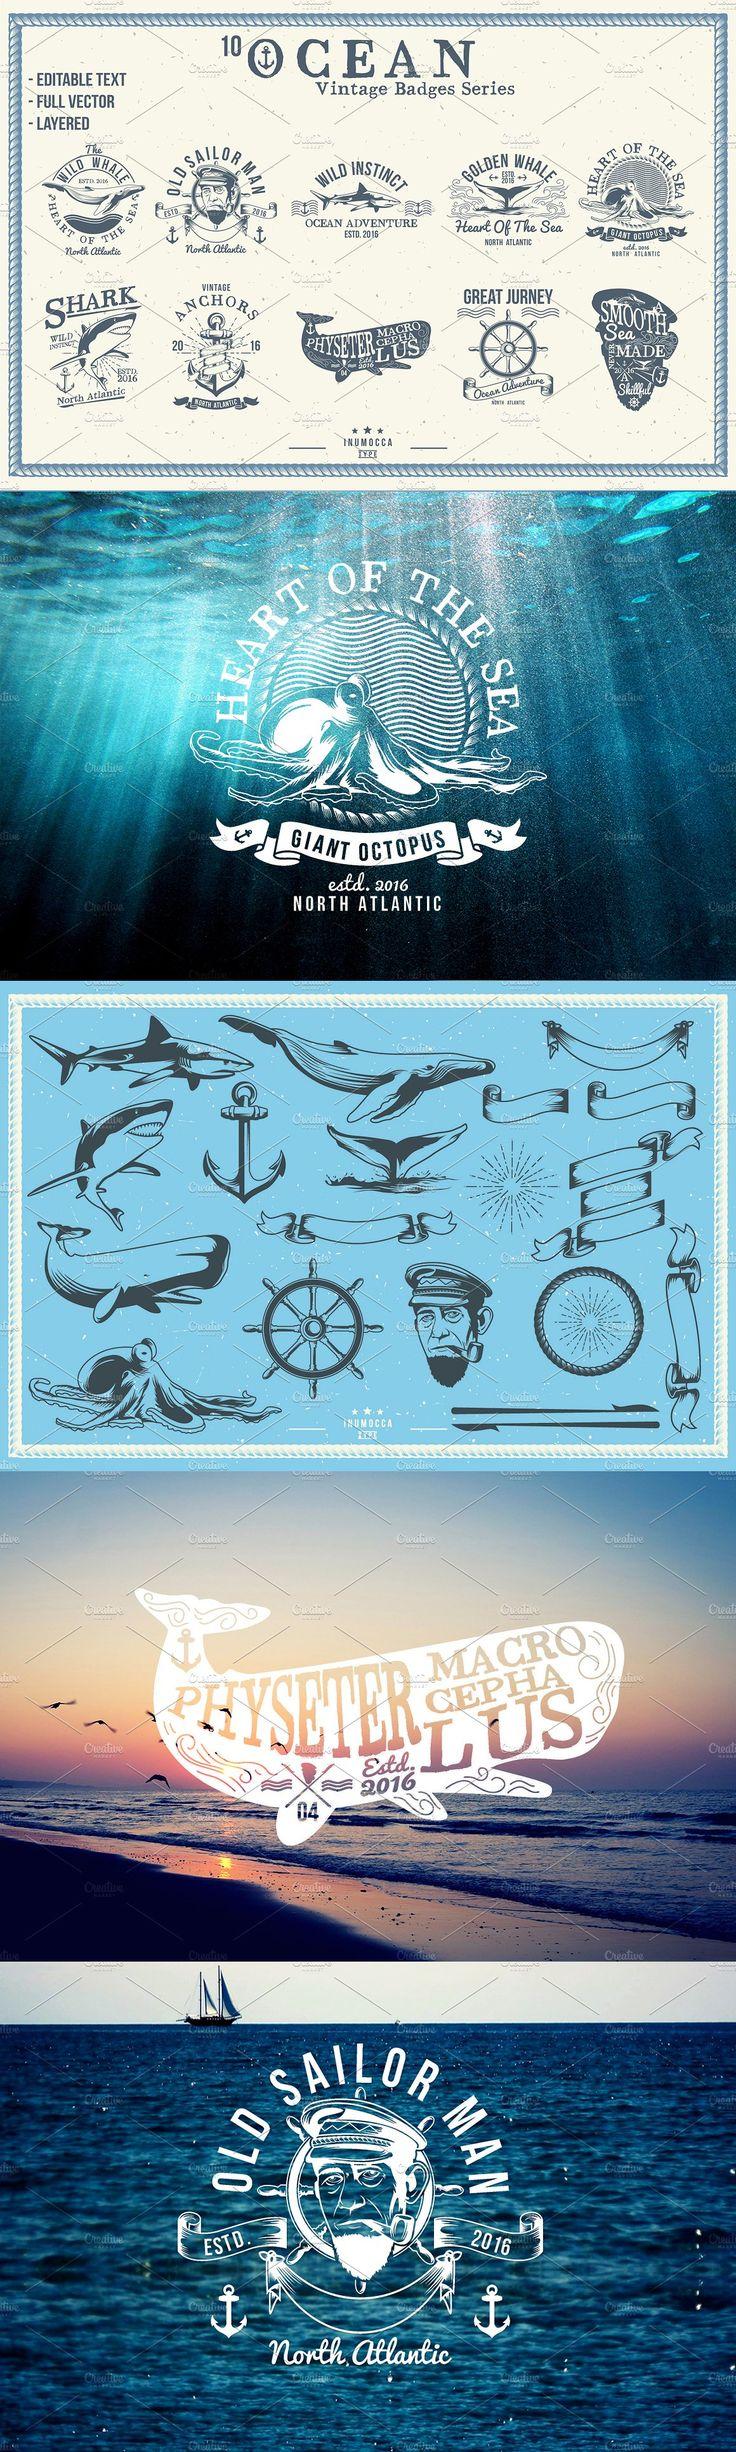 10 Ocean Vintage (editable text) Templates EPS, AI